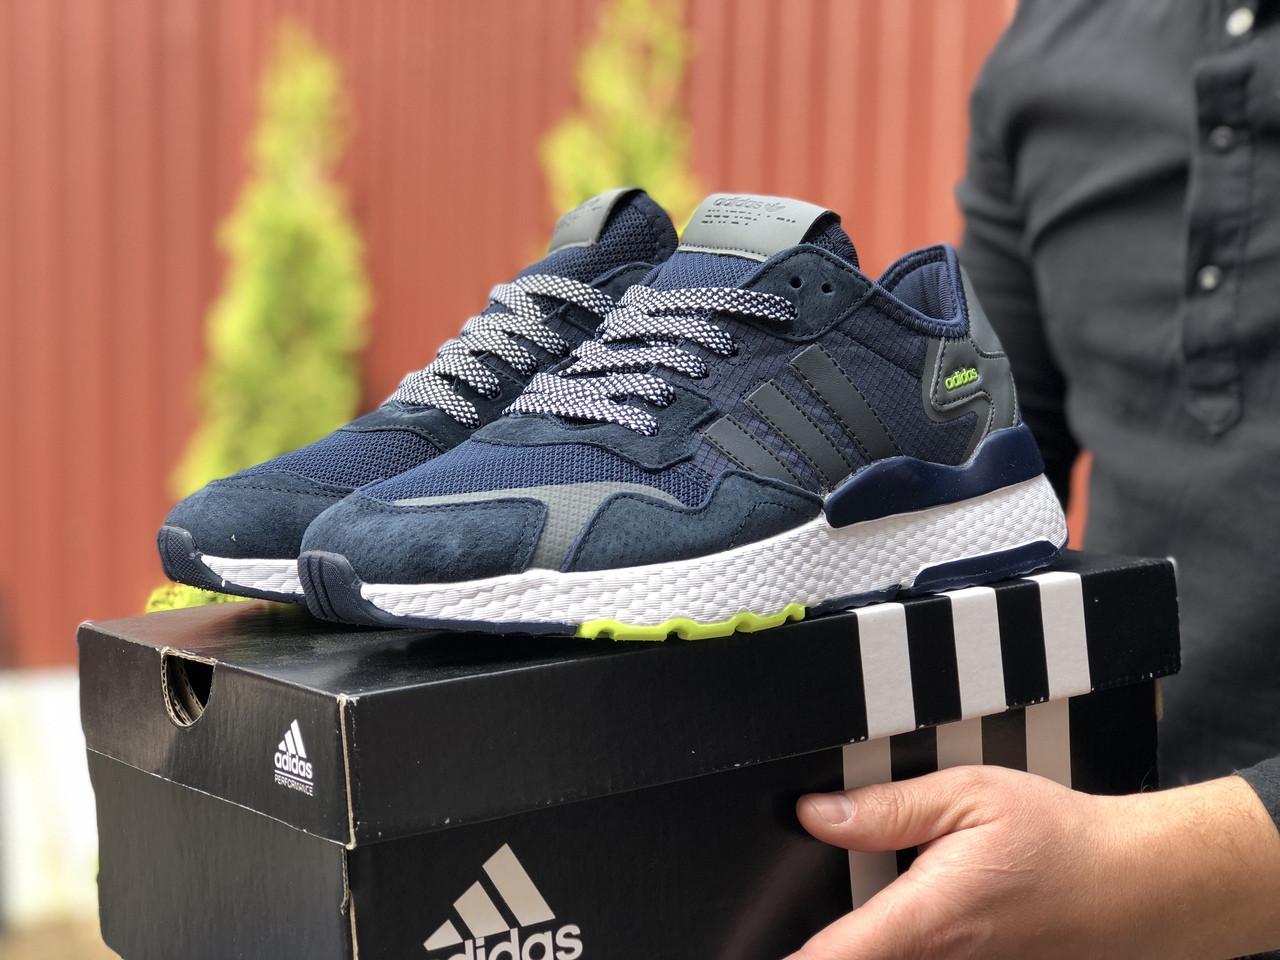 Мужские кроссовки Adidas Nite Jogger (темно-синие) 9372